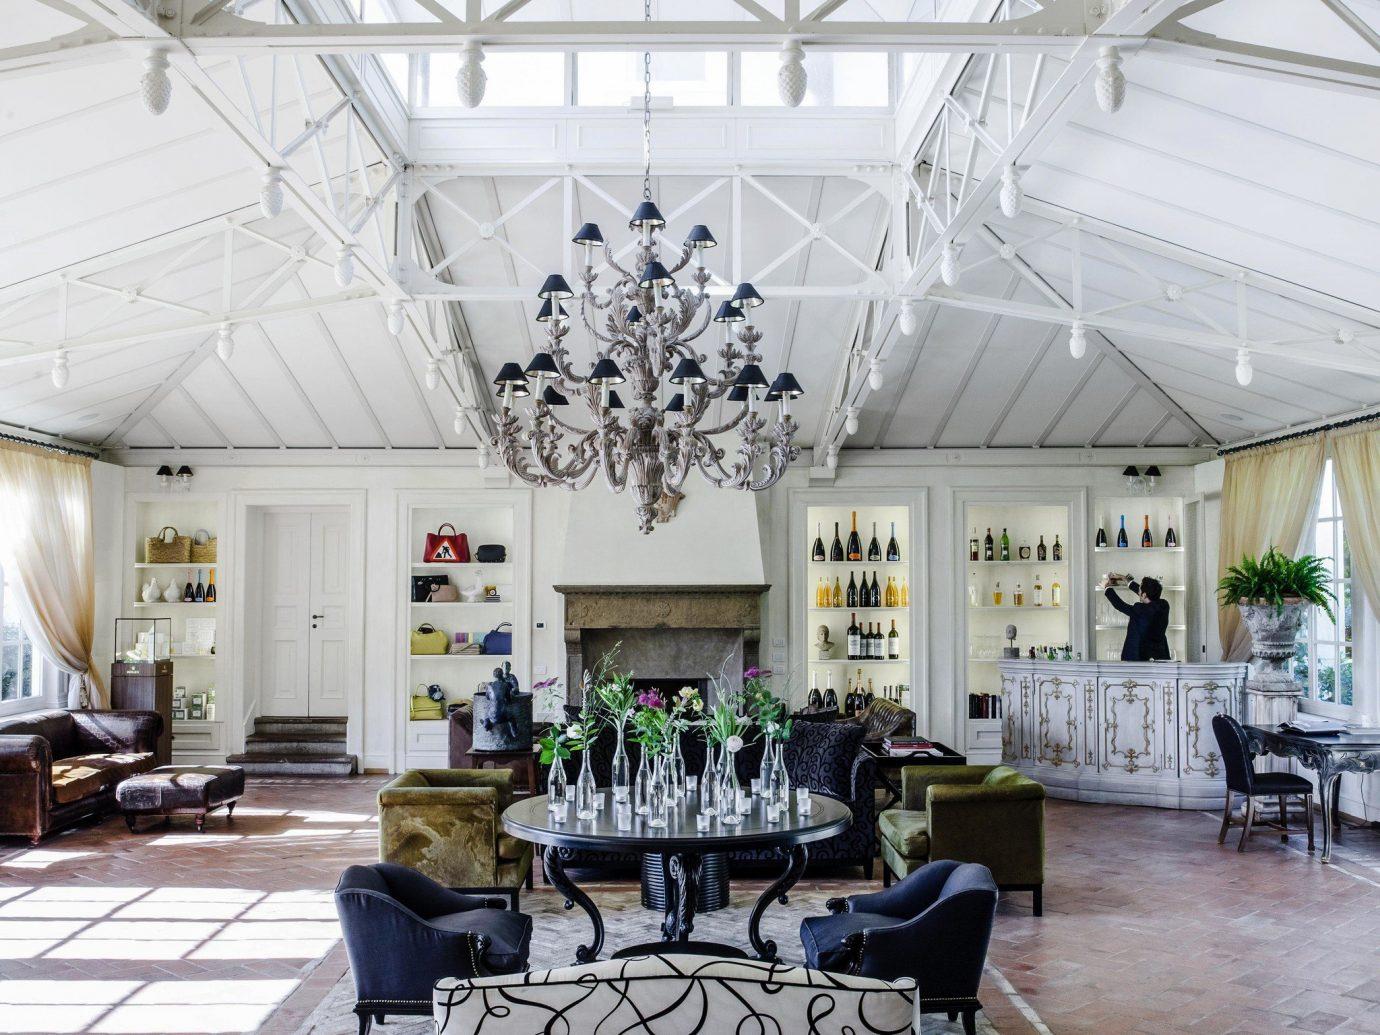 Hotels Romance indoor floor ceiling interior design Architecture room Lobby daylighting loft furniture